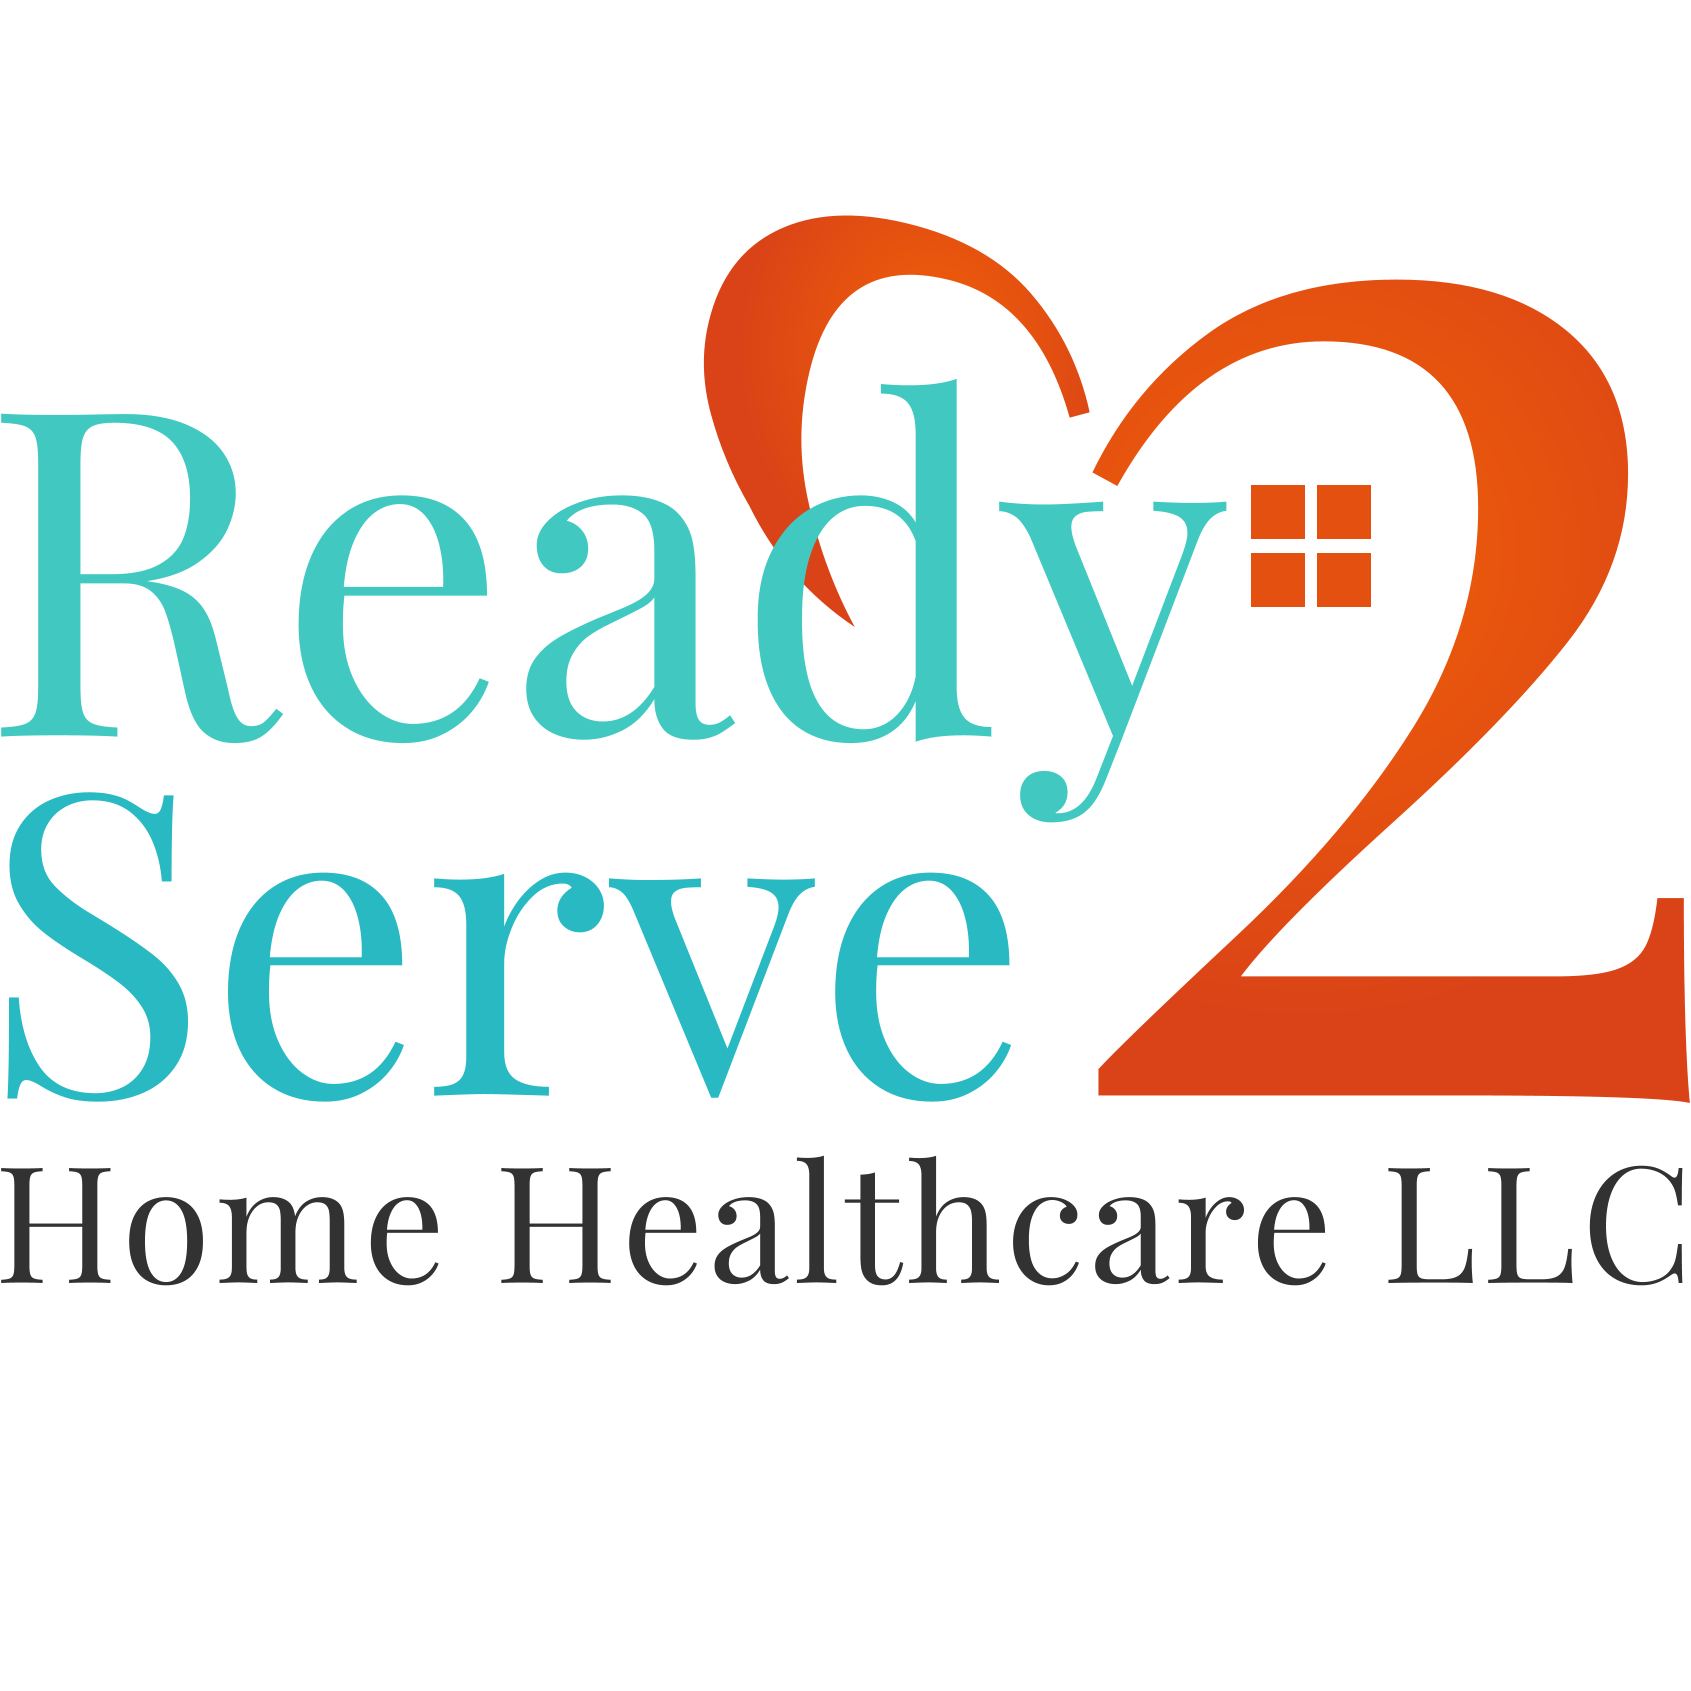 Ready 2 Serve Home Healthcare, LLC image 0